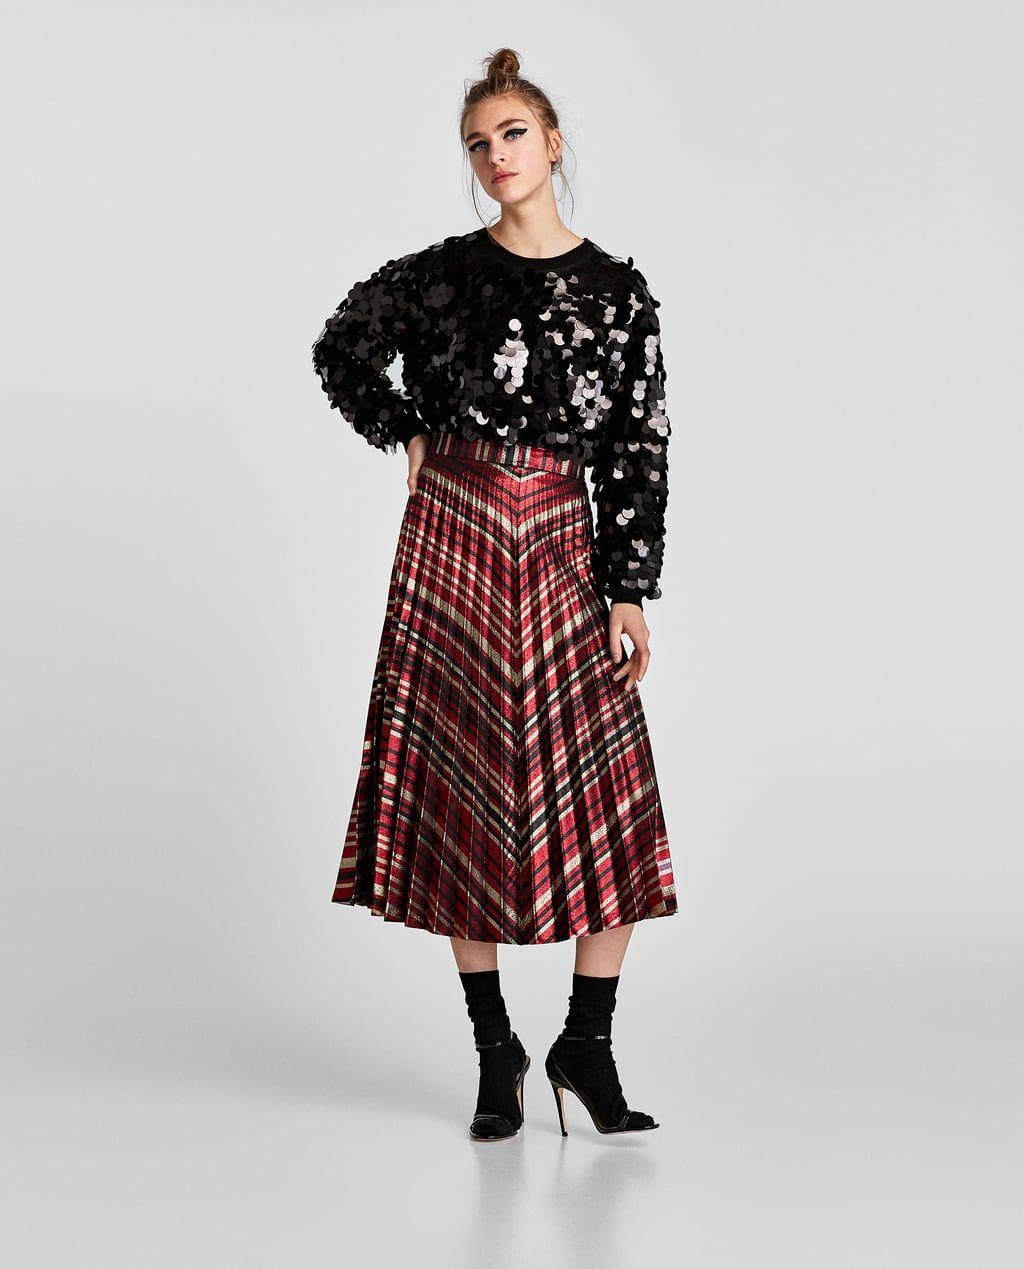 eb7463a50 FALDA PLISADA RAYAS | Lookbooks. | Striped skirt outfit, Fashion, Skirts